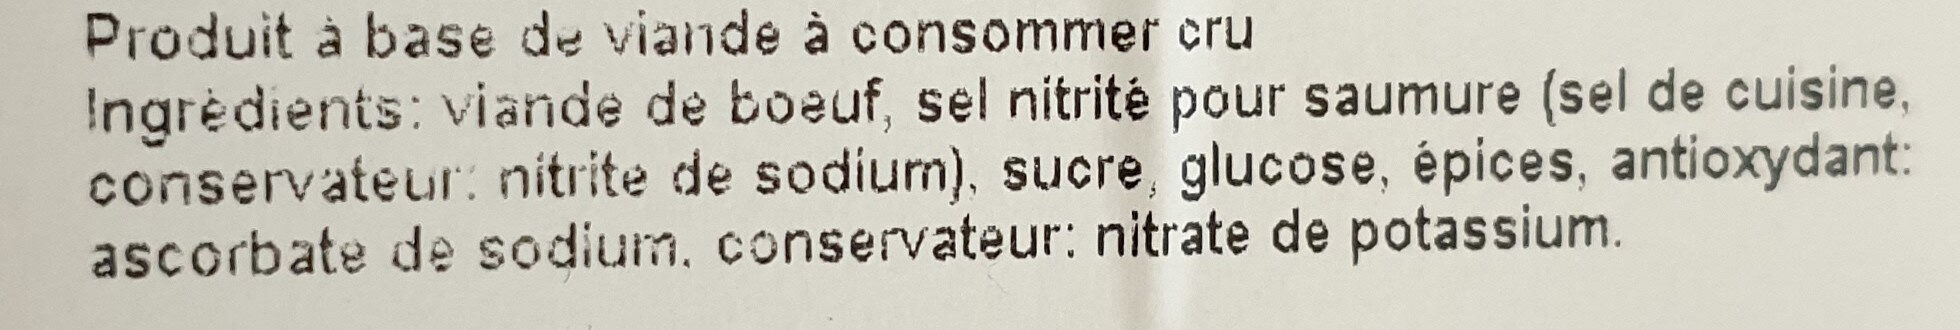 Viande séchée de boeuf - Ingredients - fr